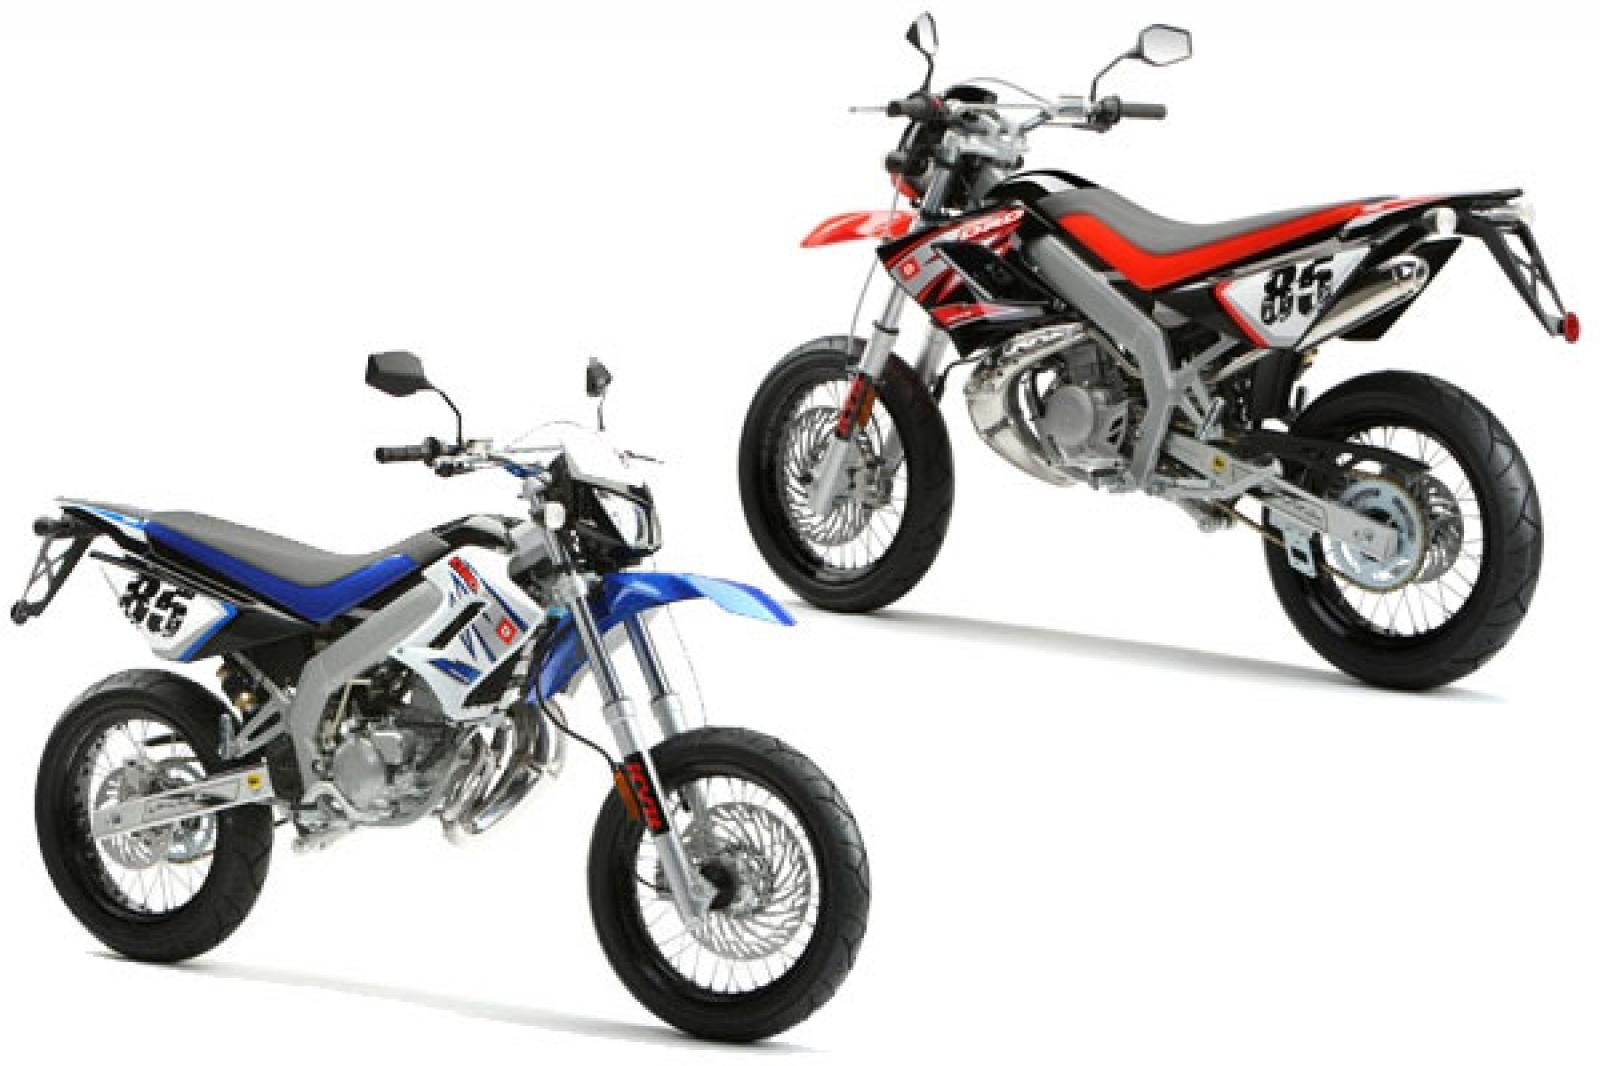 Moto 50cc Derbi. derbi kit d co pornstar motos 50cc